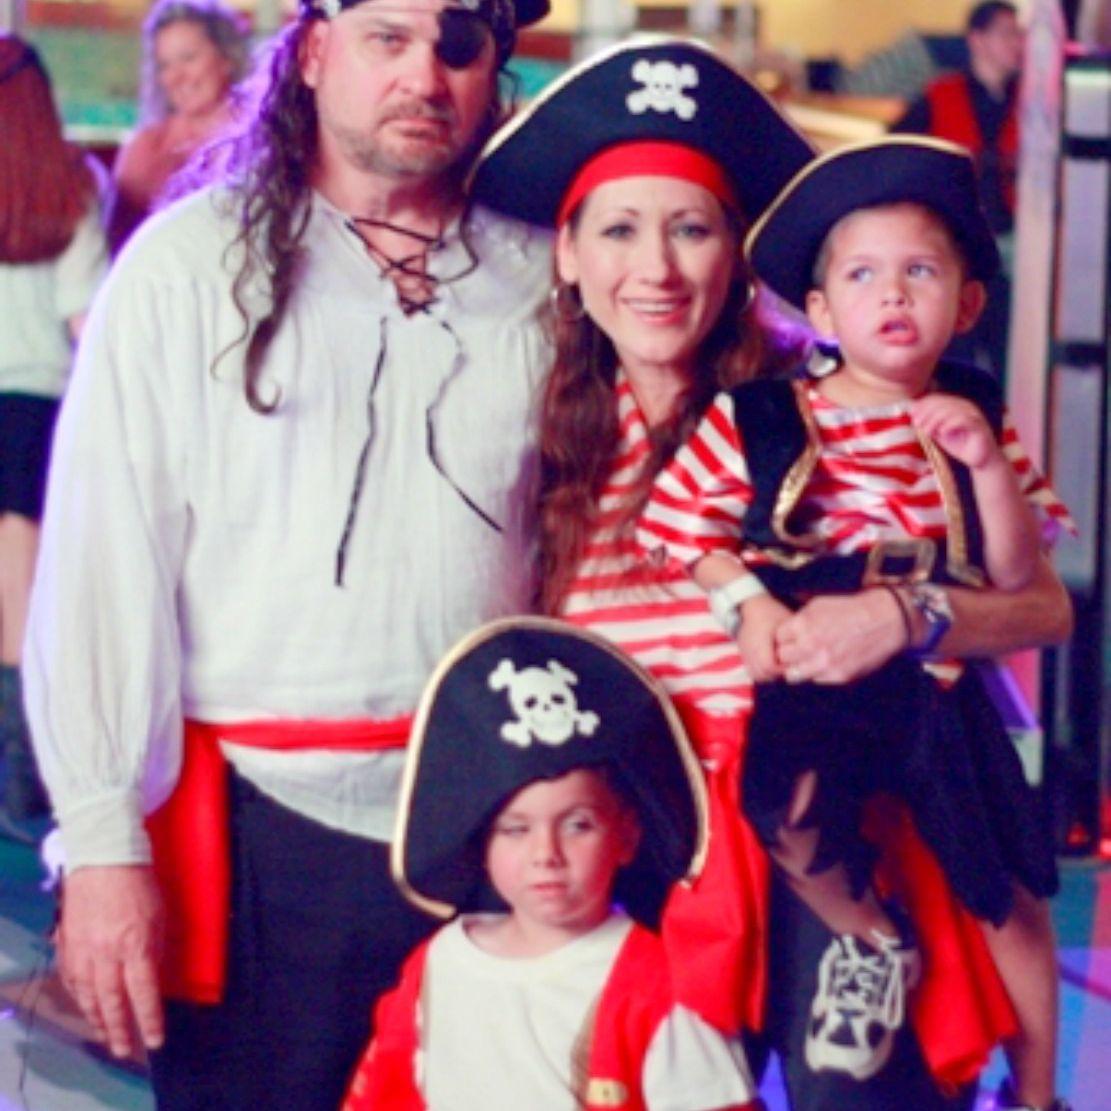 Pinterest Cruise Theme Costume